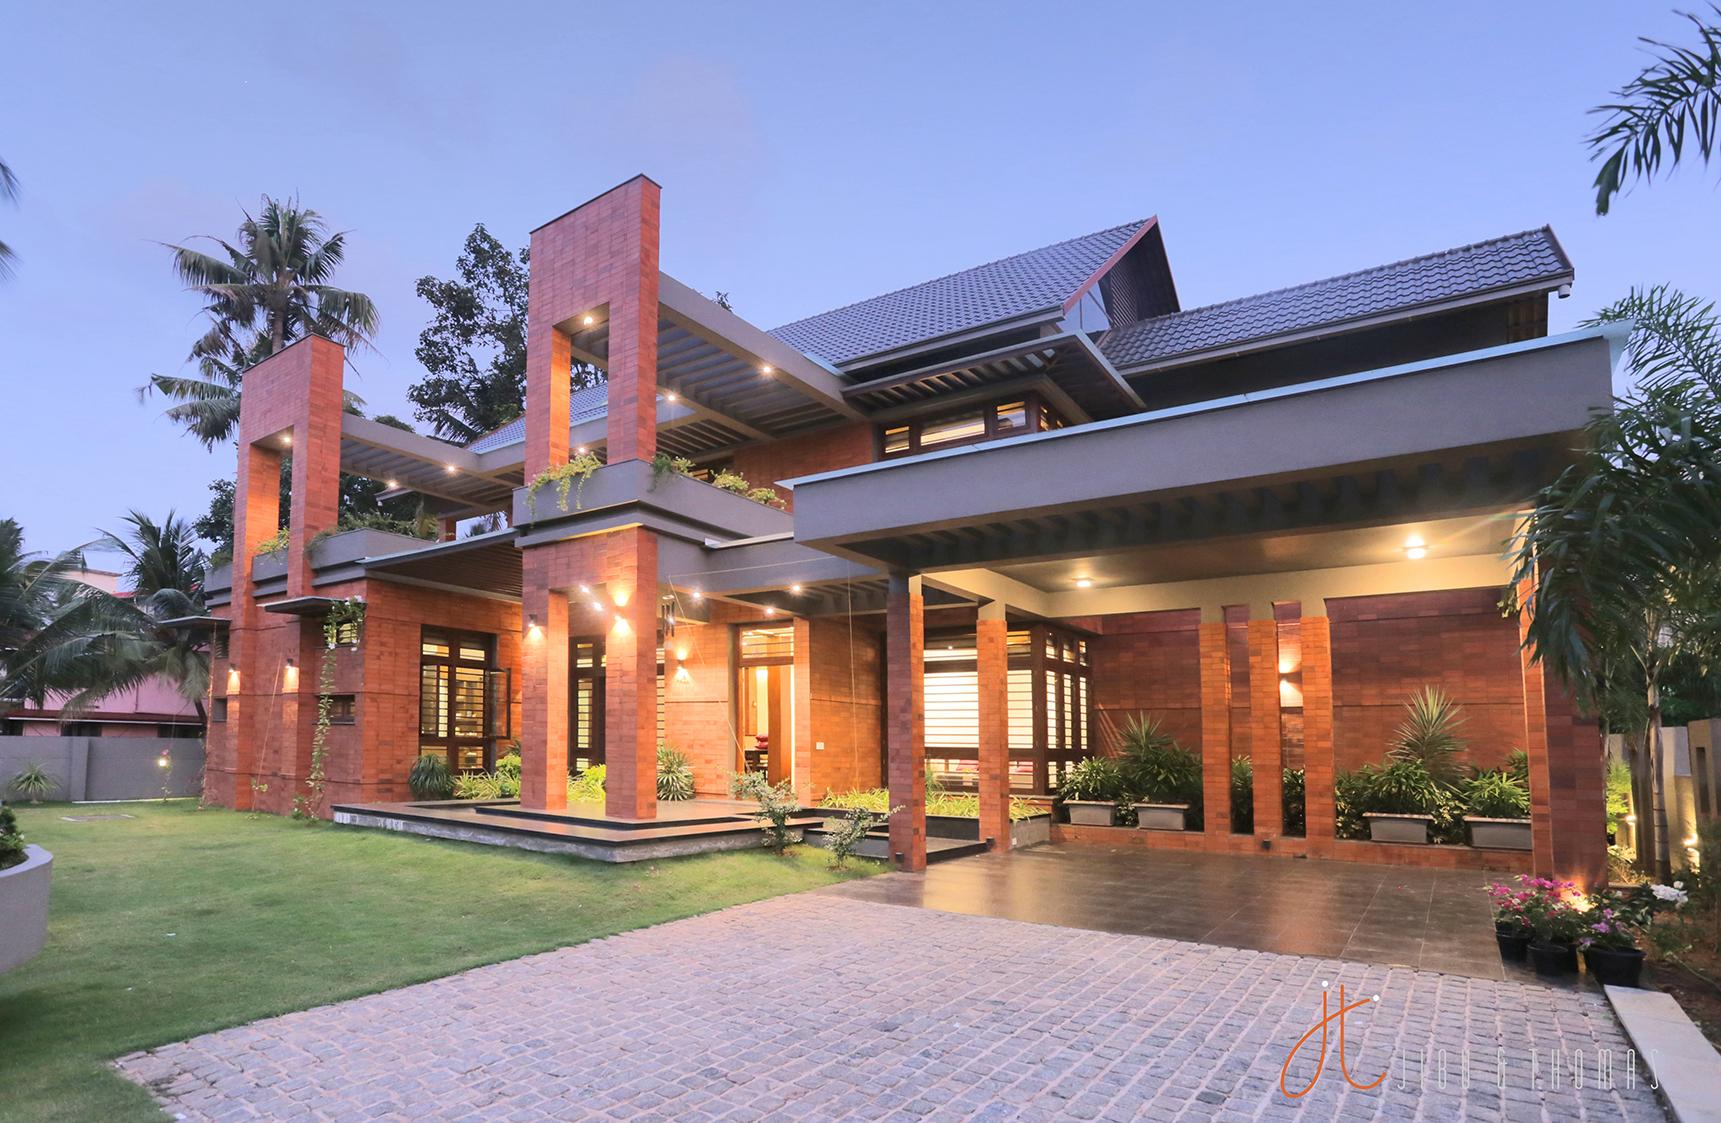 Jibu Amp Thomas 187 Residence Of Dr Jose Mathew